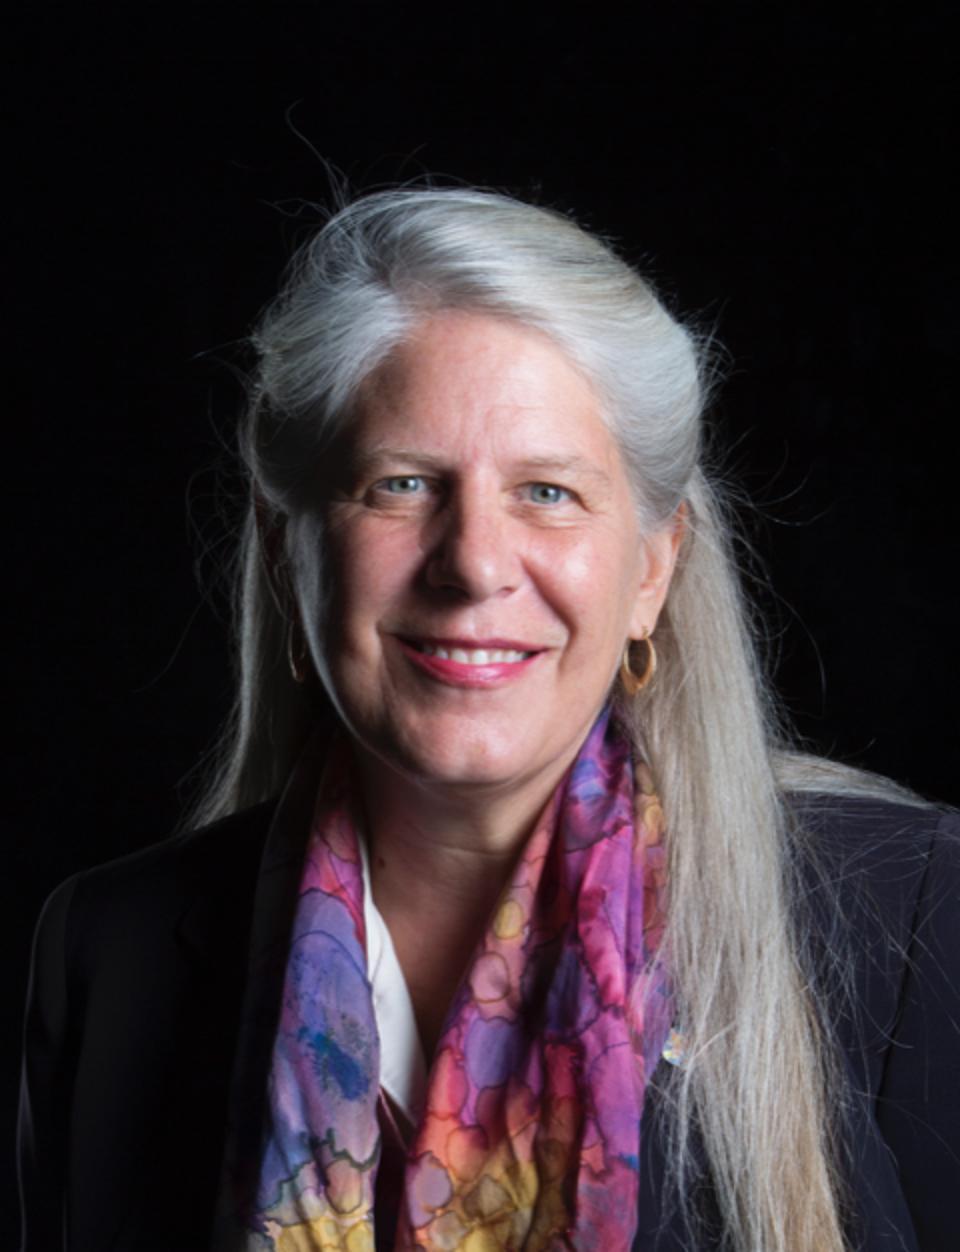 Brain researcher, Jill Bolte Taylor